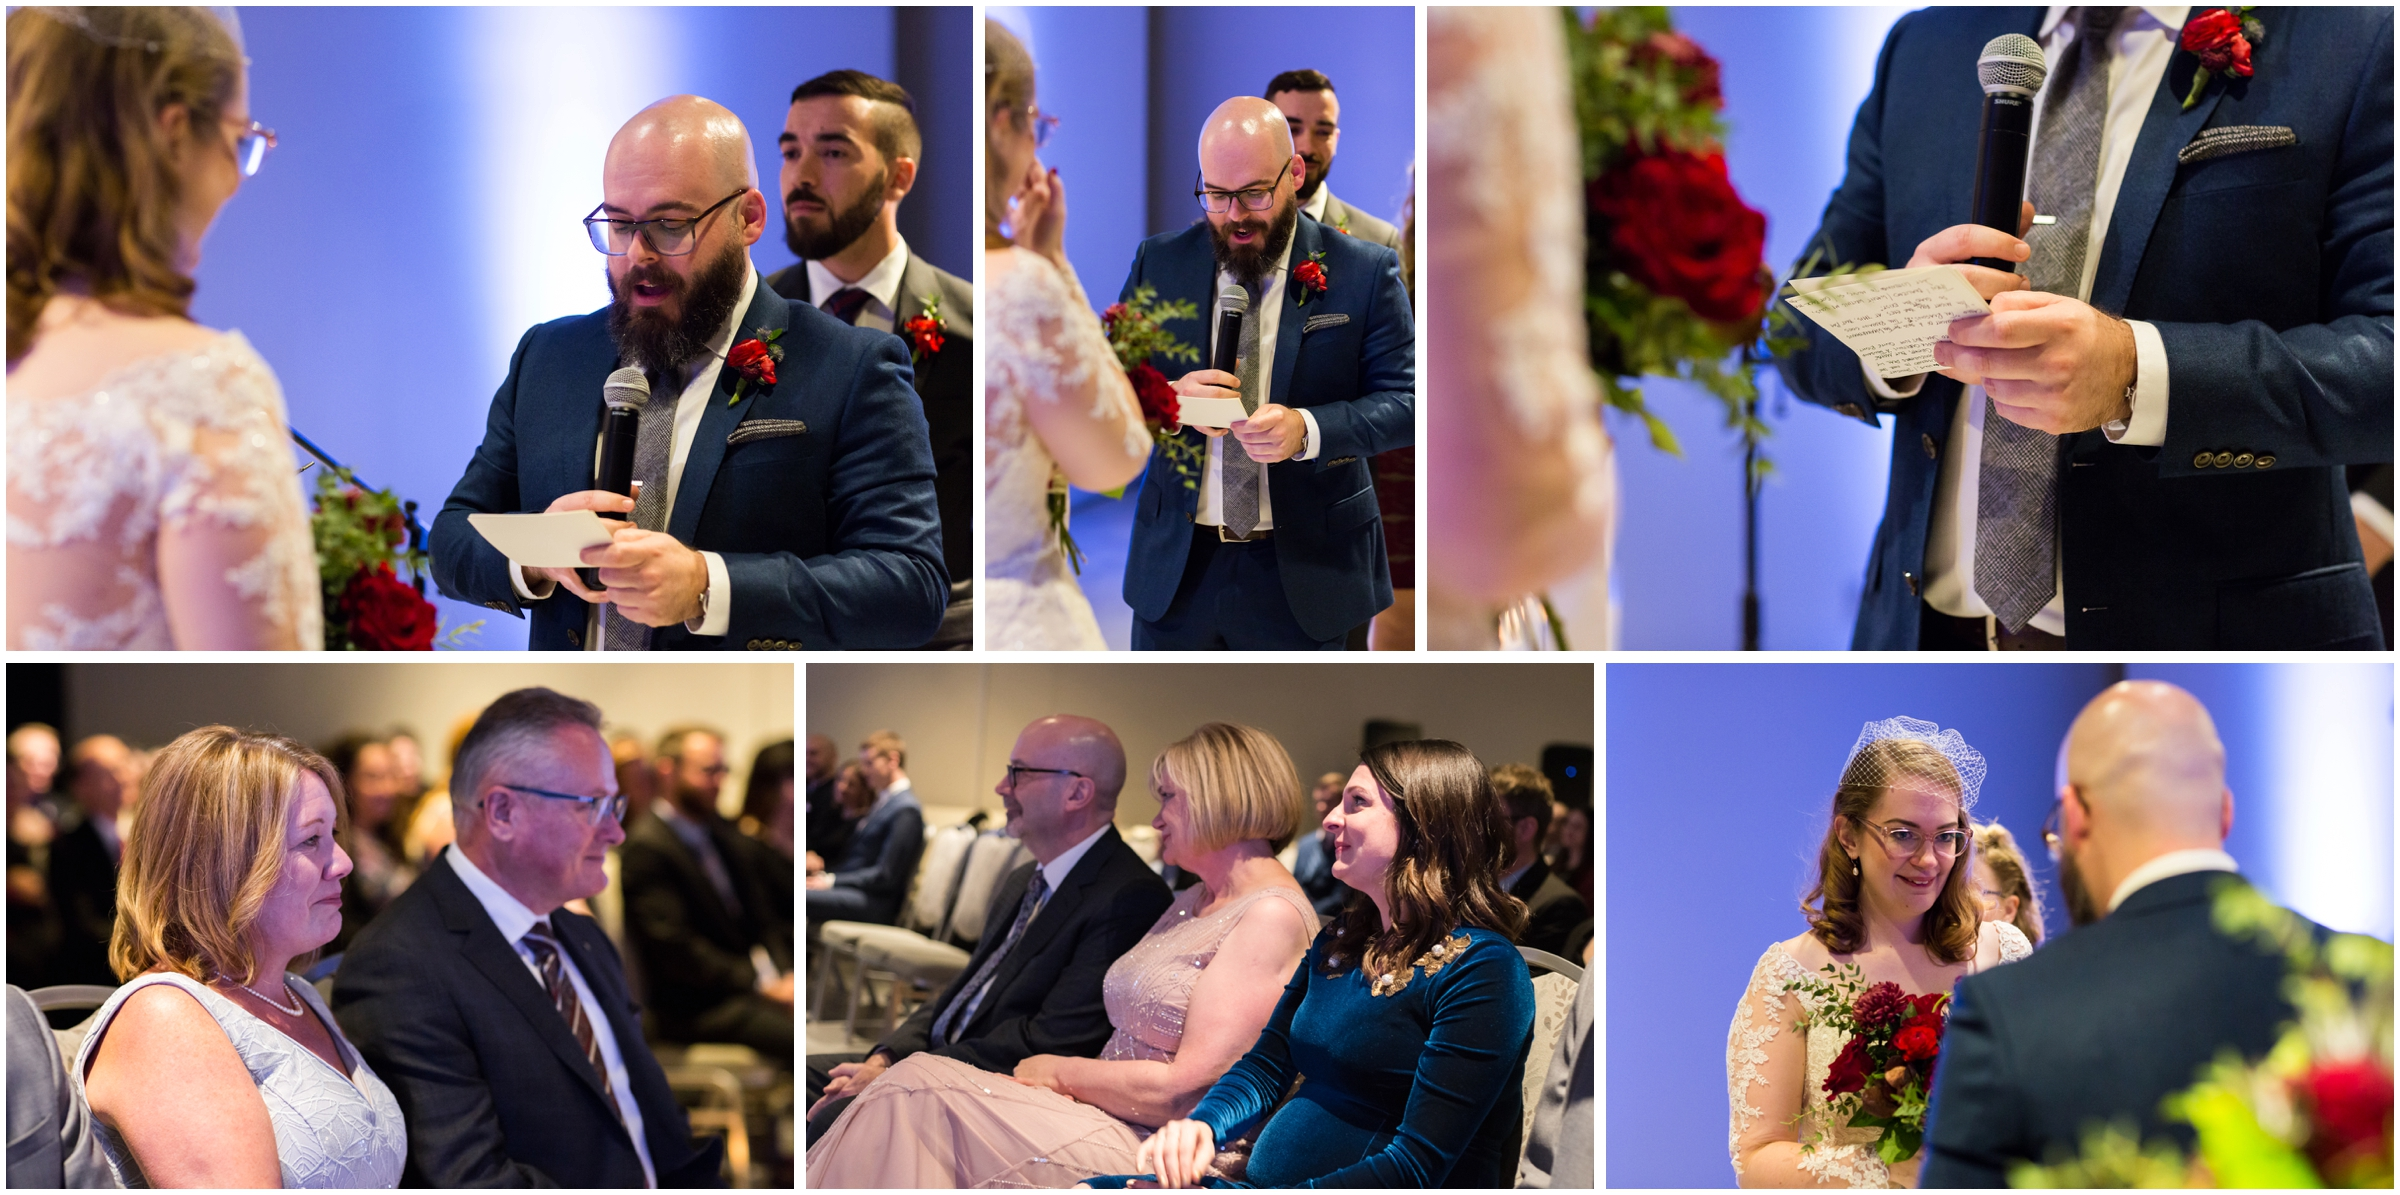 Ottaw Wedding Allison Andrew - (Selena Phillips-Boyle)_0072.jpg